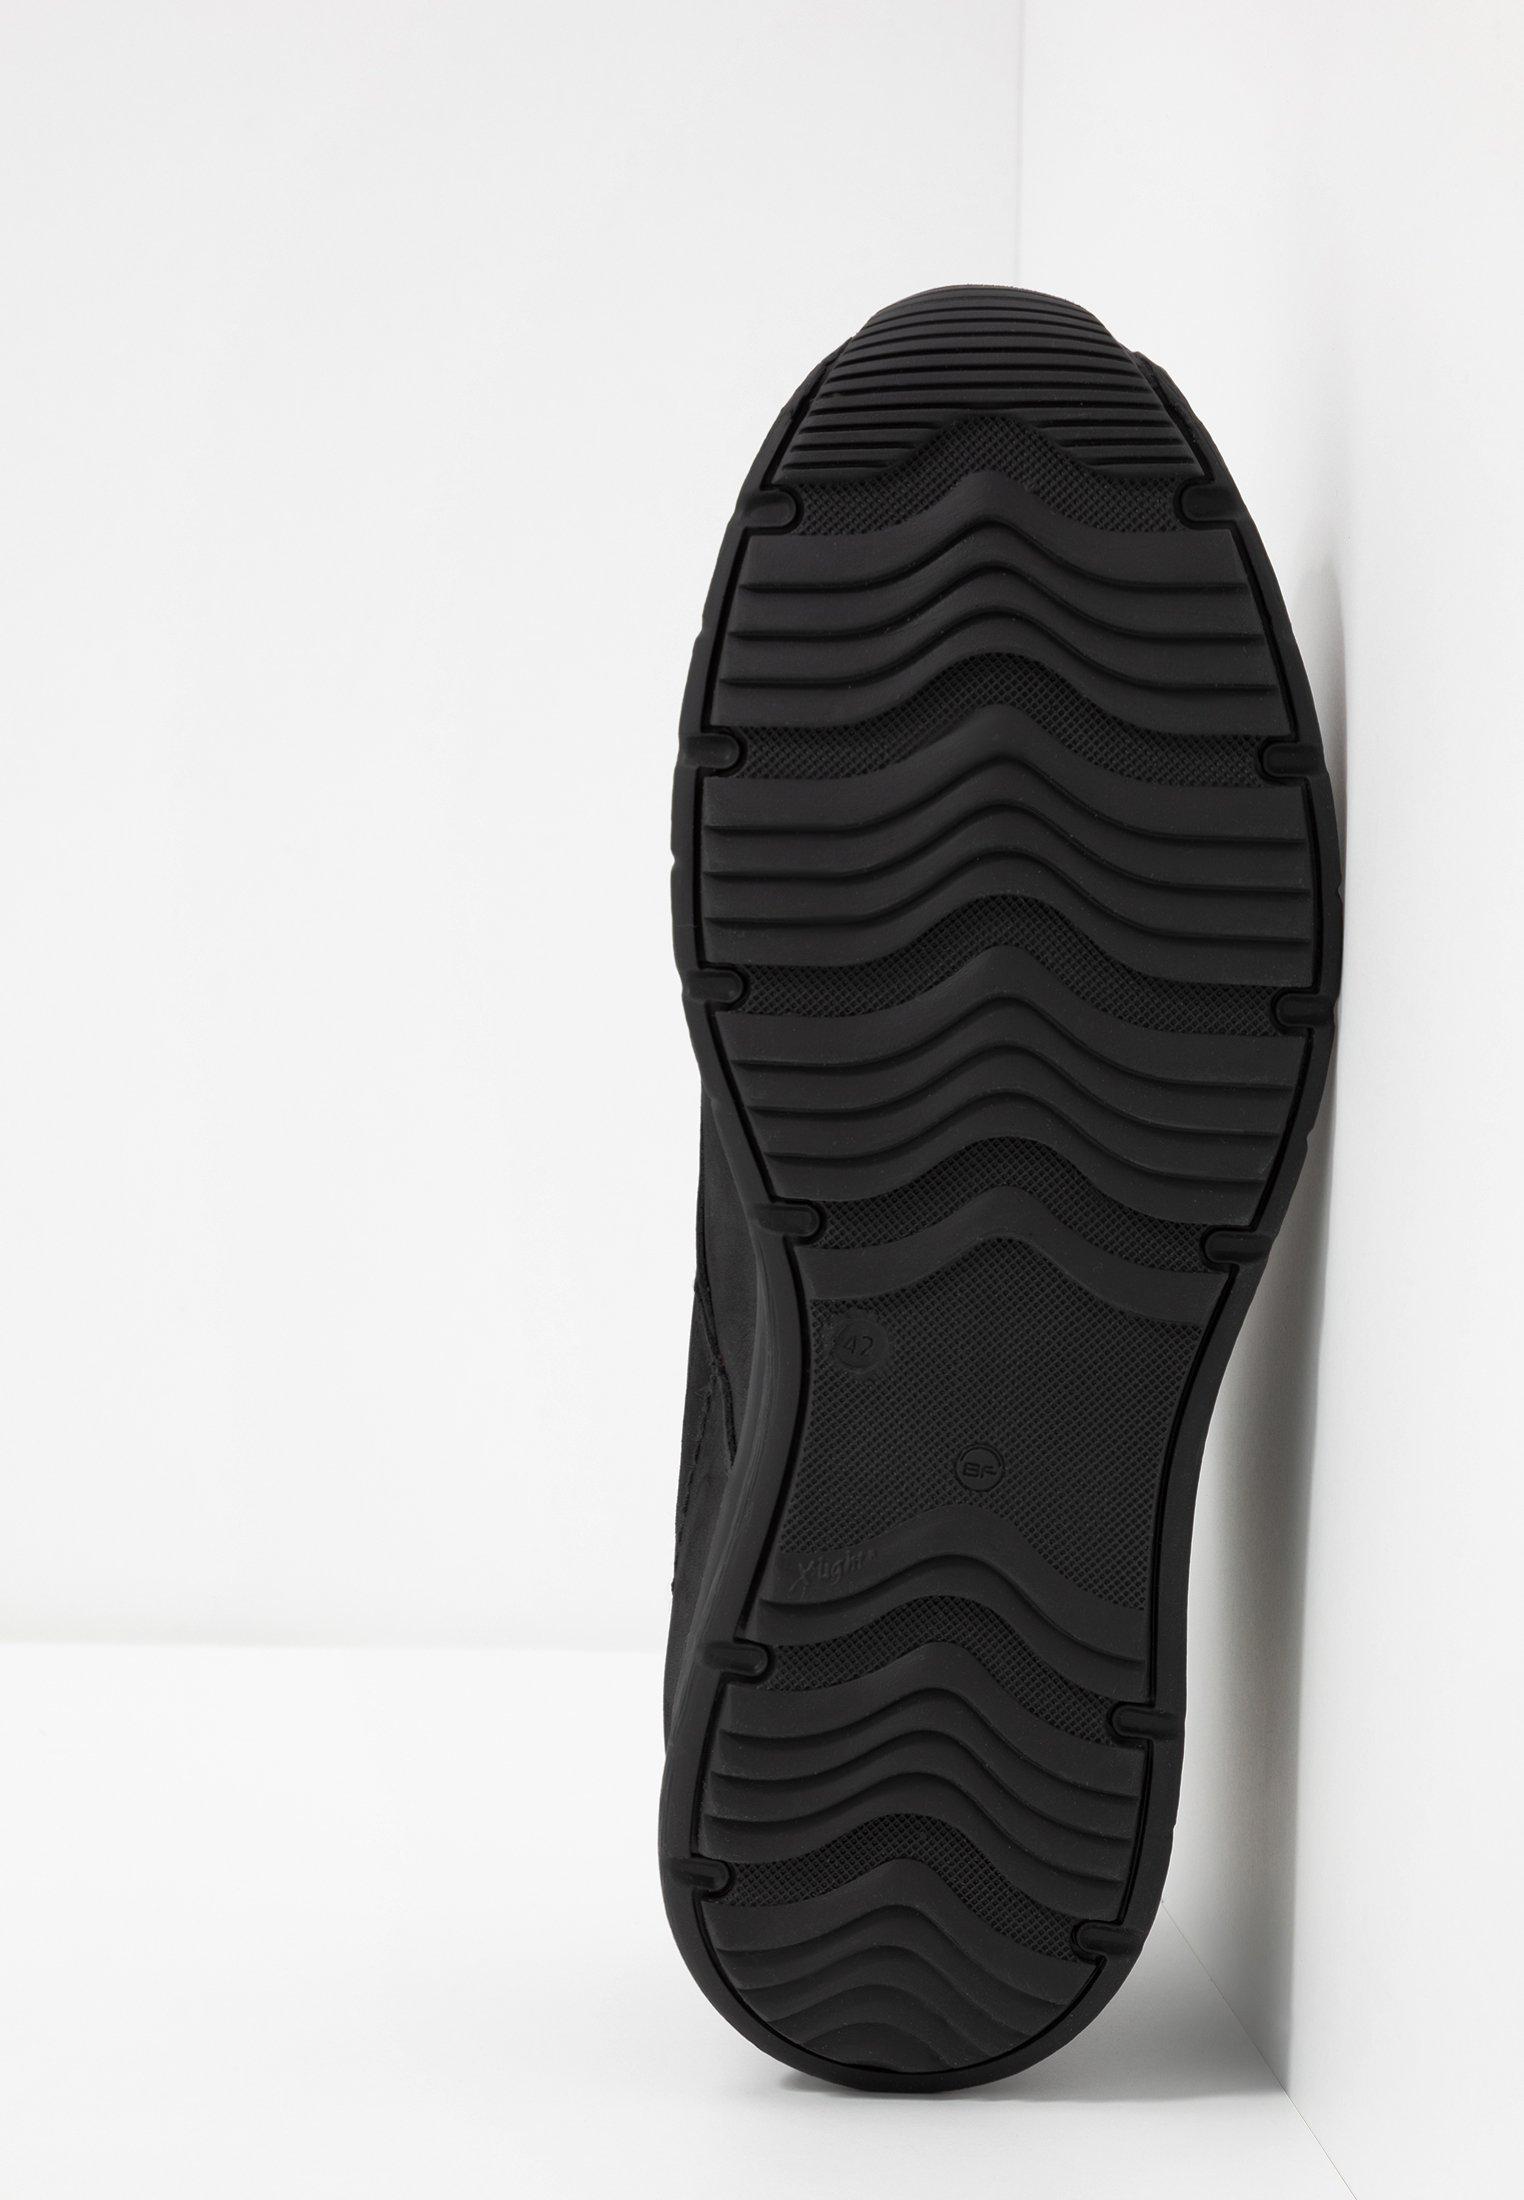 Zign Sneaker High - Black Friday